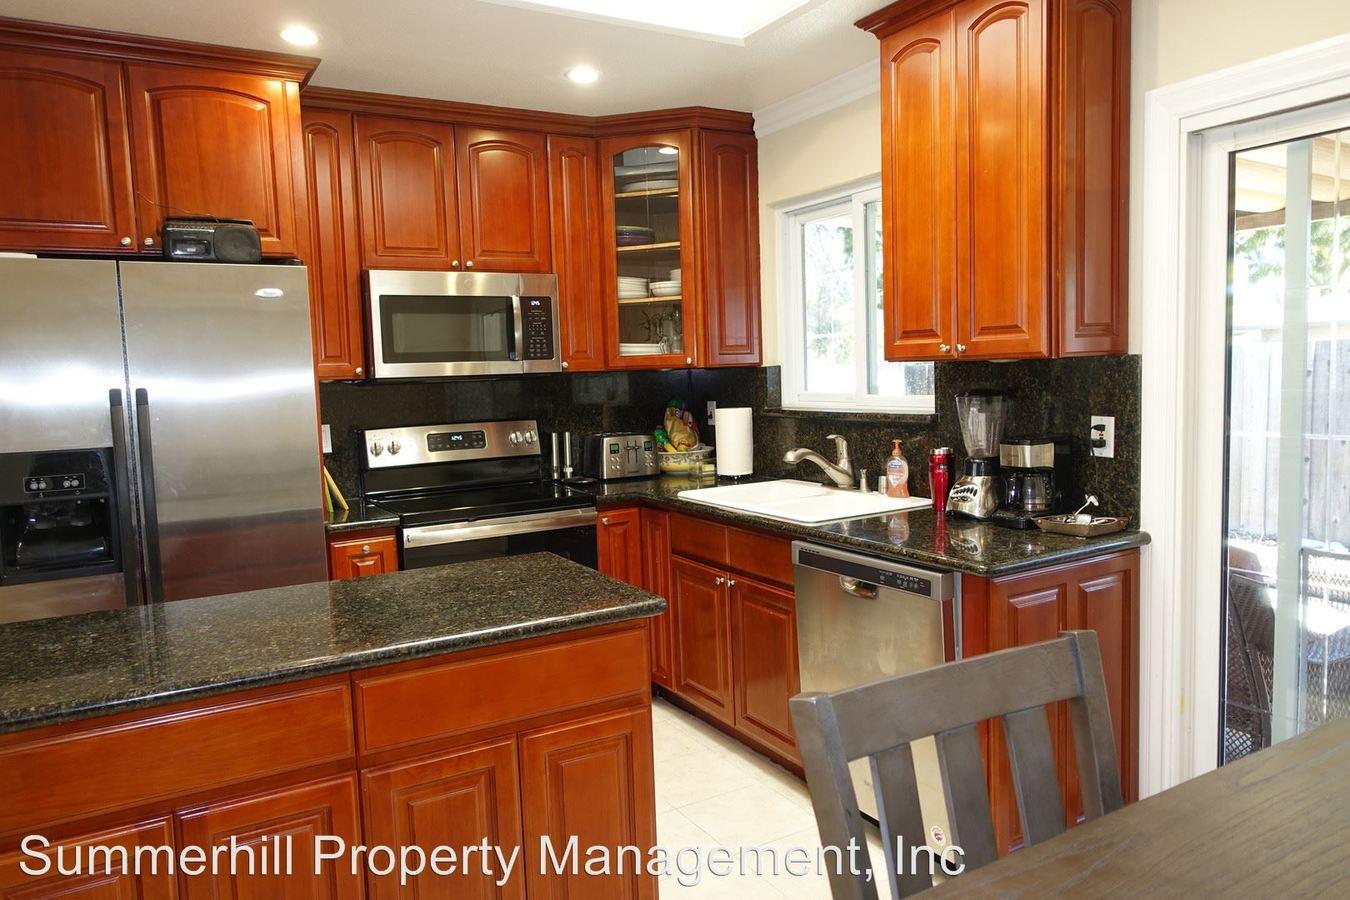 2 Bedrooms 1 Bathroom Apartment for rent at 2107 Fallen Leaf Lane & 1700 Marhsall Court in Los Altos, CA